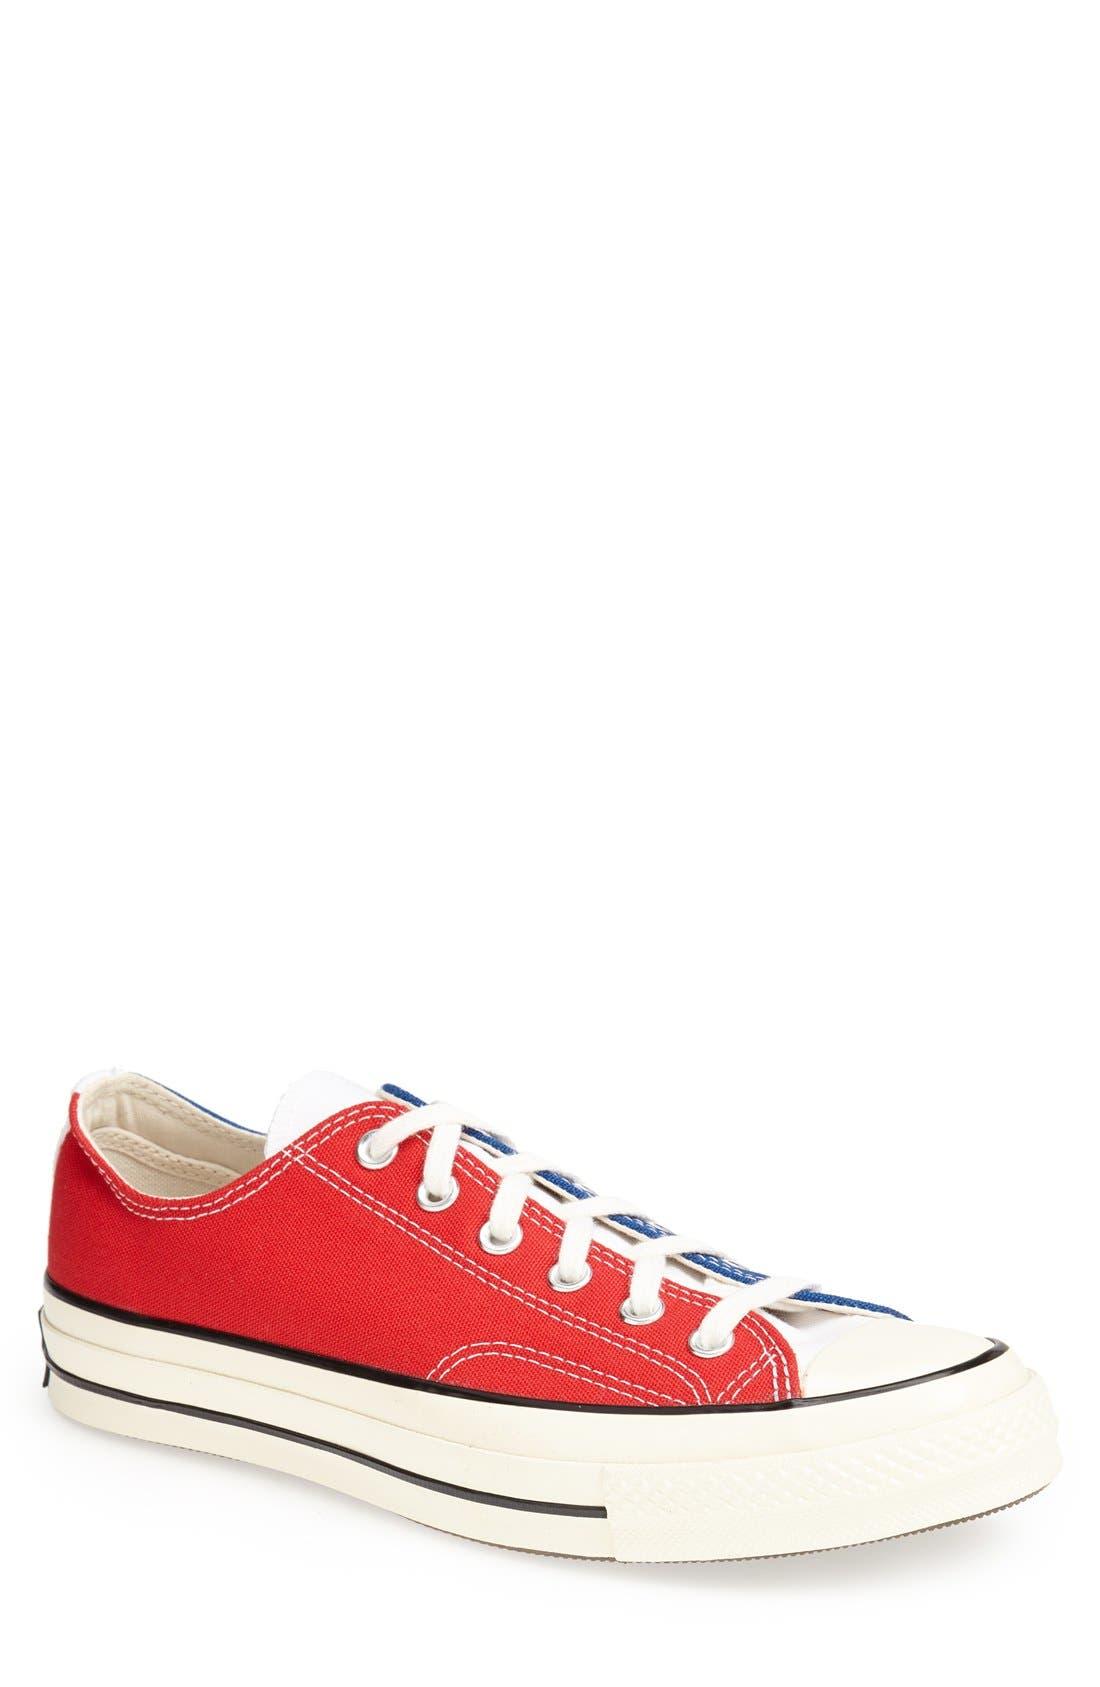 Main Image - Converse Chuck Taylor® All Star® '70 Three-Panel Canvas Sneaker (Men)